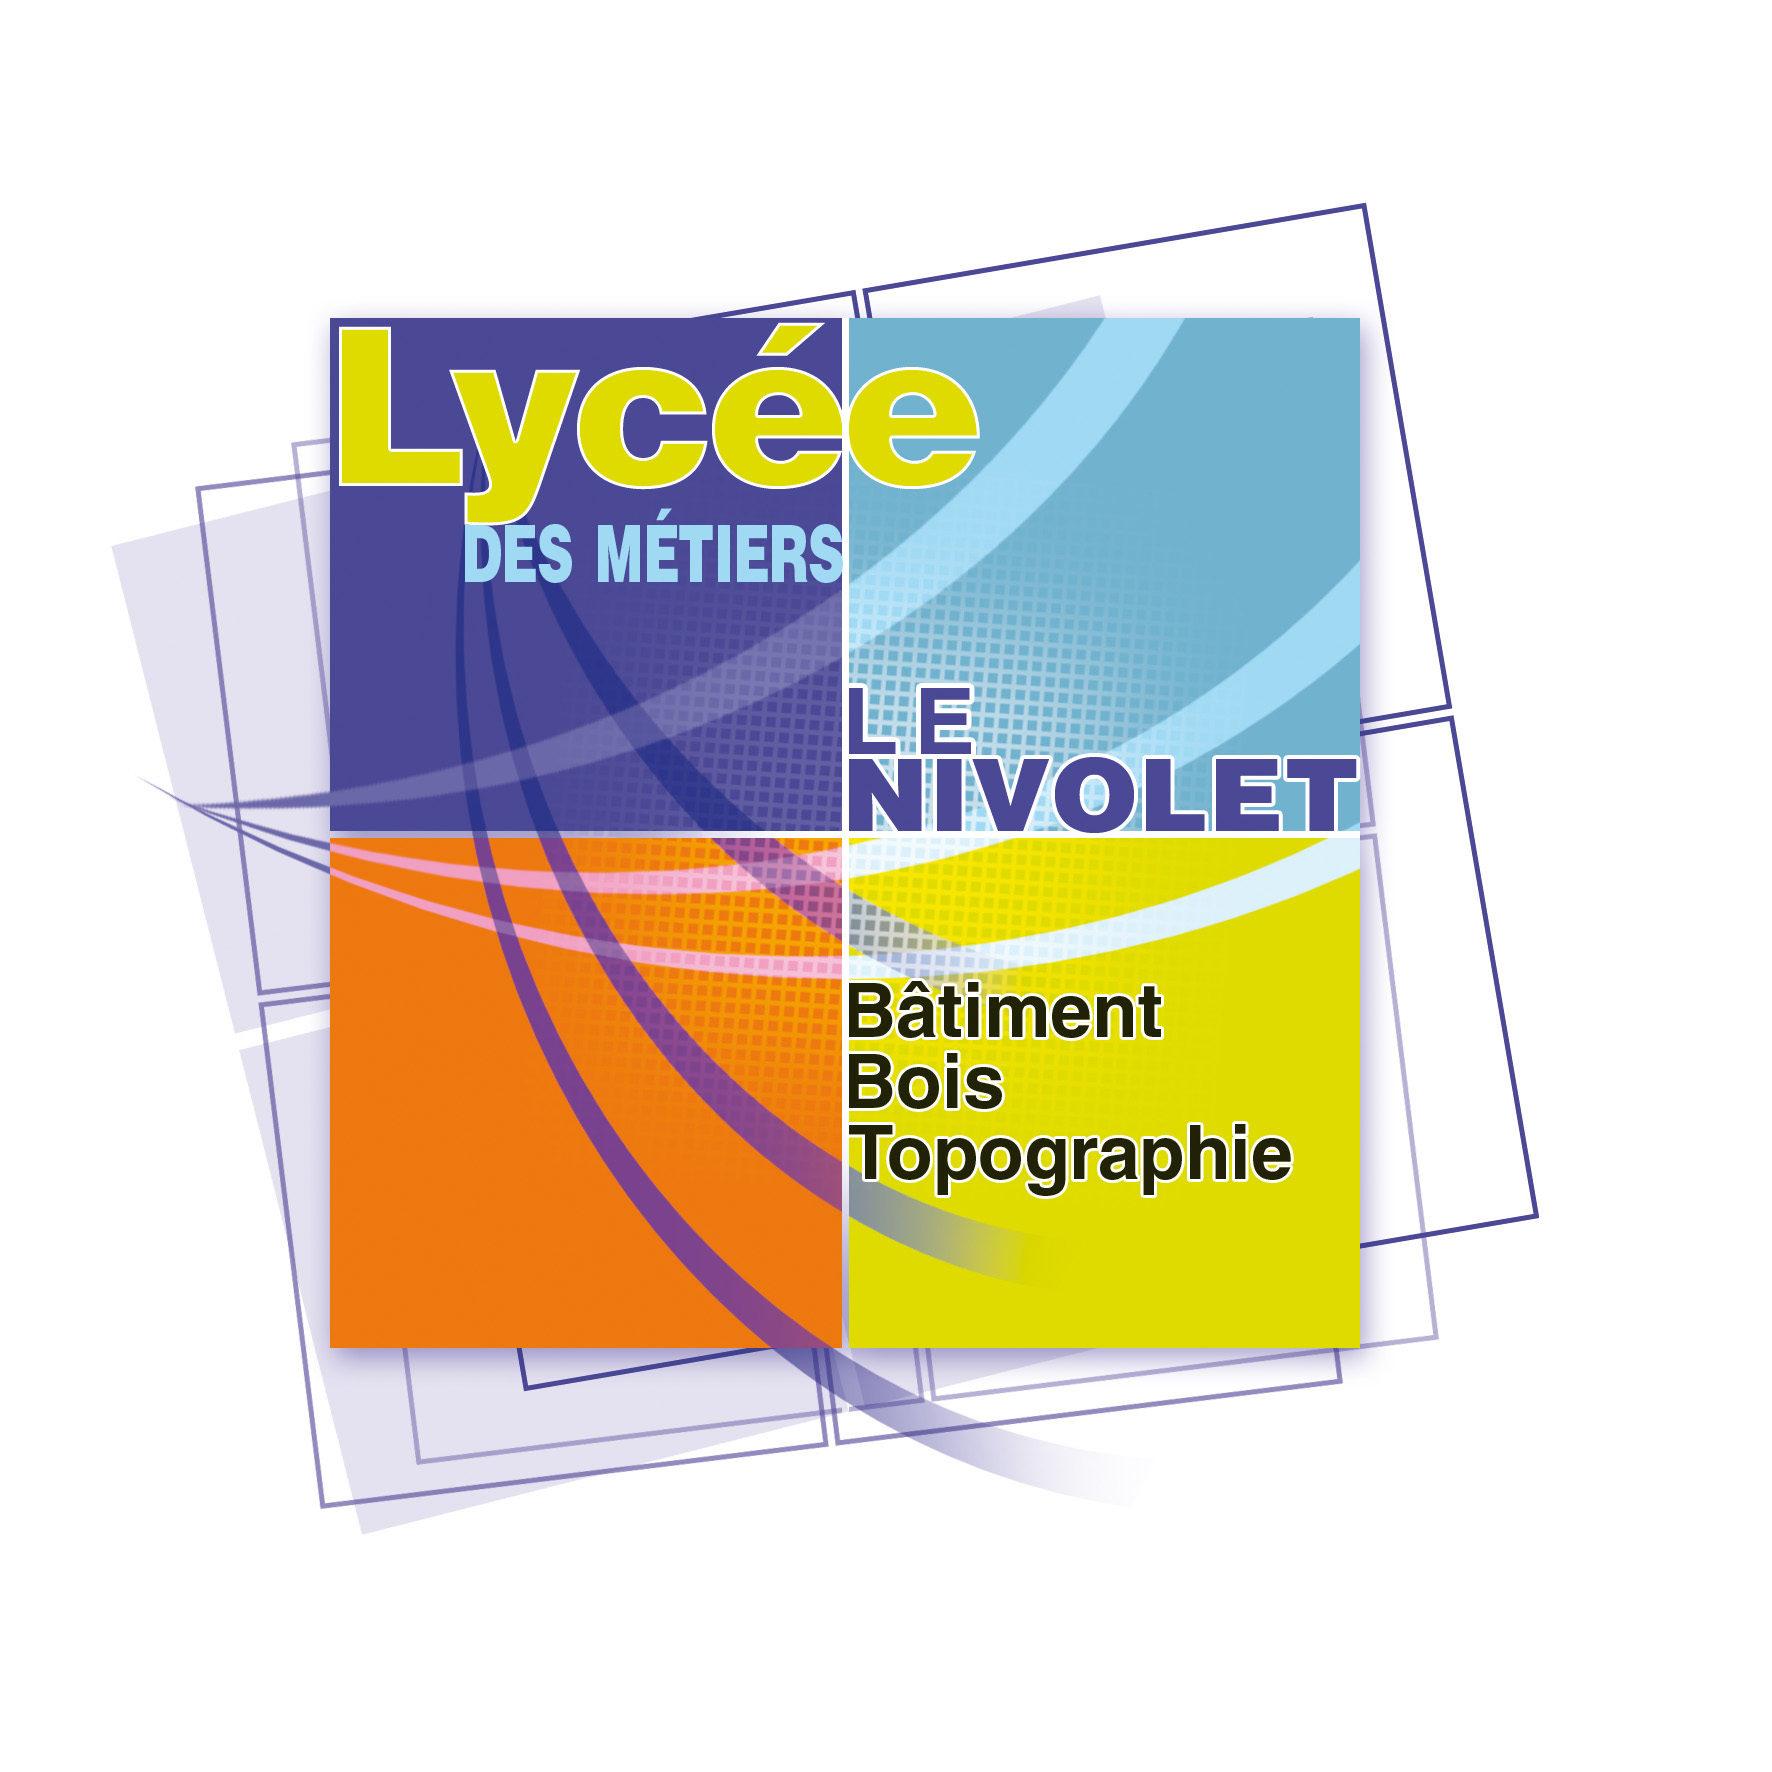 logo lyc-e m-tiers NIVOLET.jpg